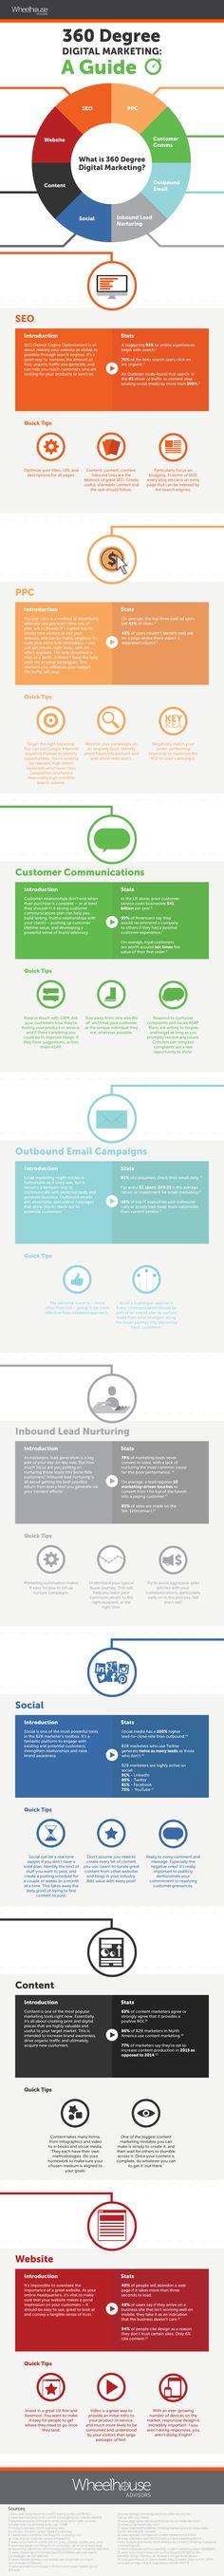 360-degree-Digital-Marketing-2015